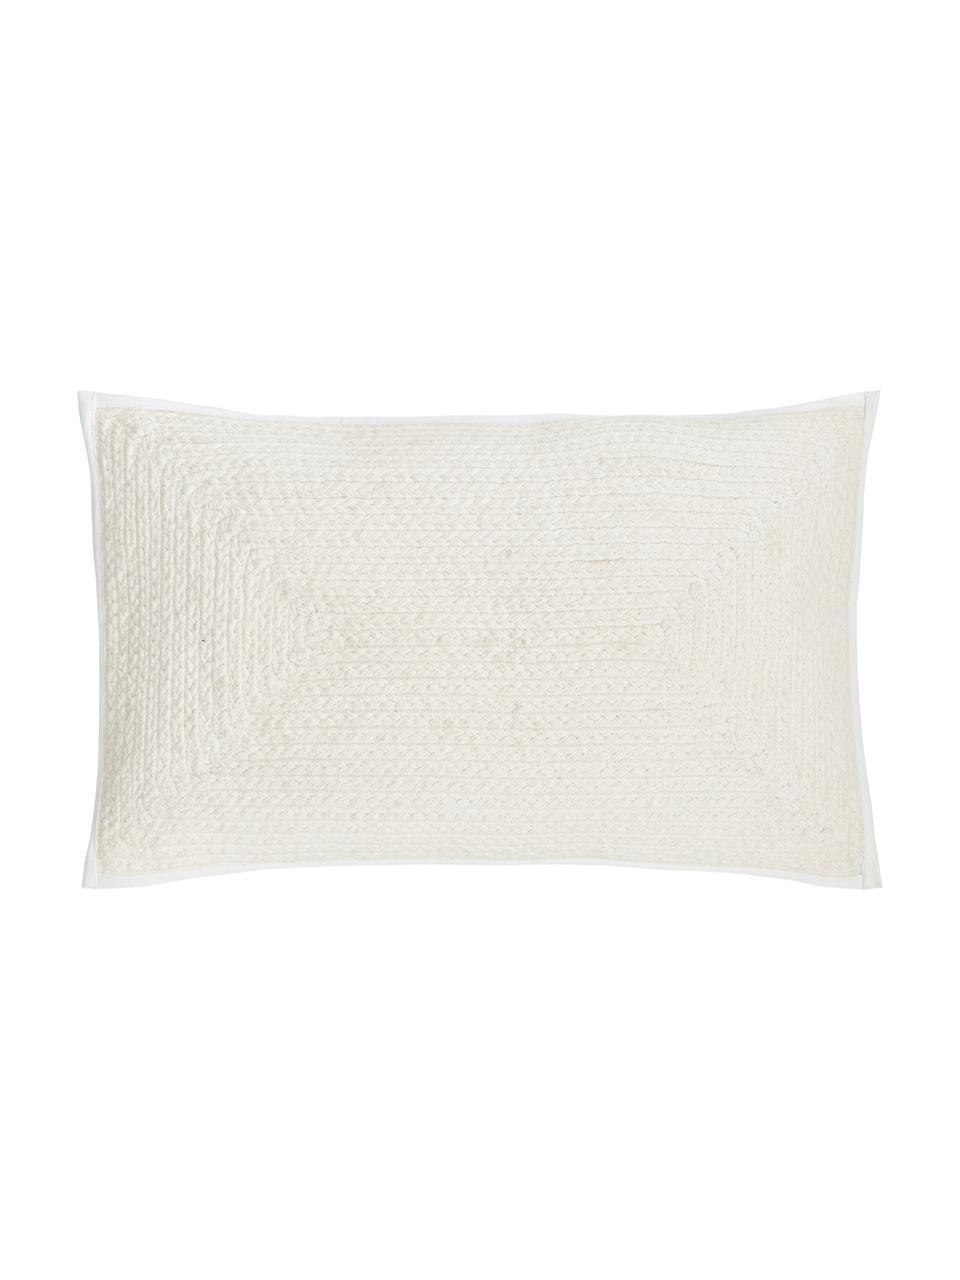 Kissenhülle Justina im Jutelook, 100% Baumwolle, Cremeweiß, 30 x 50 cm